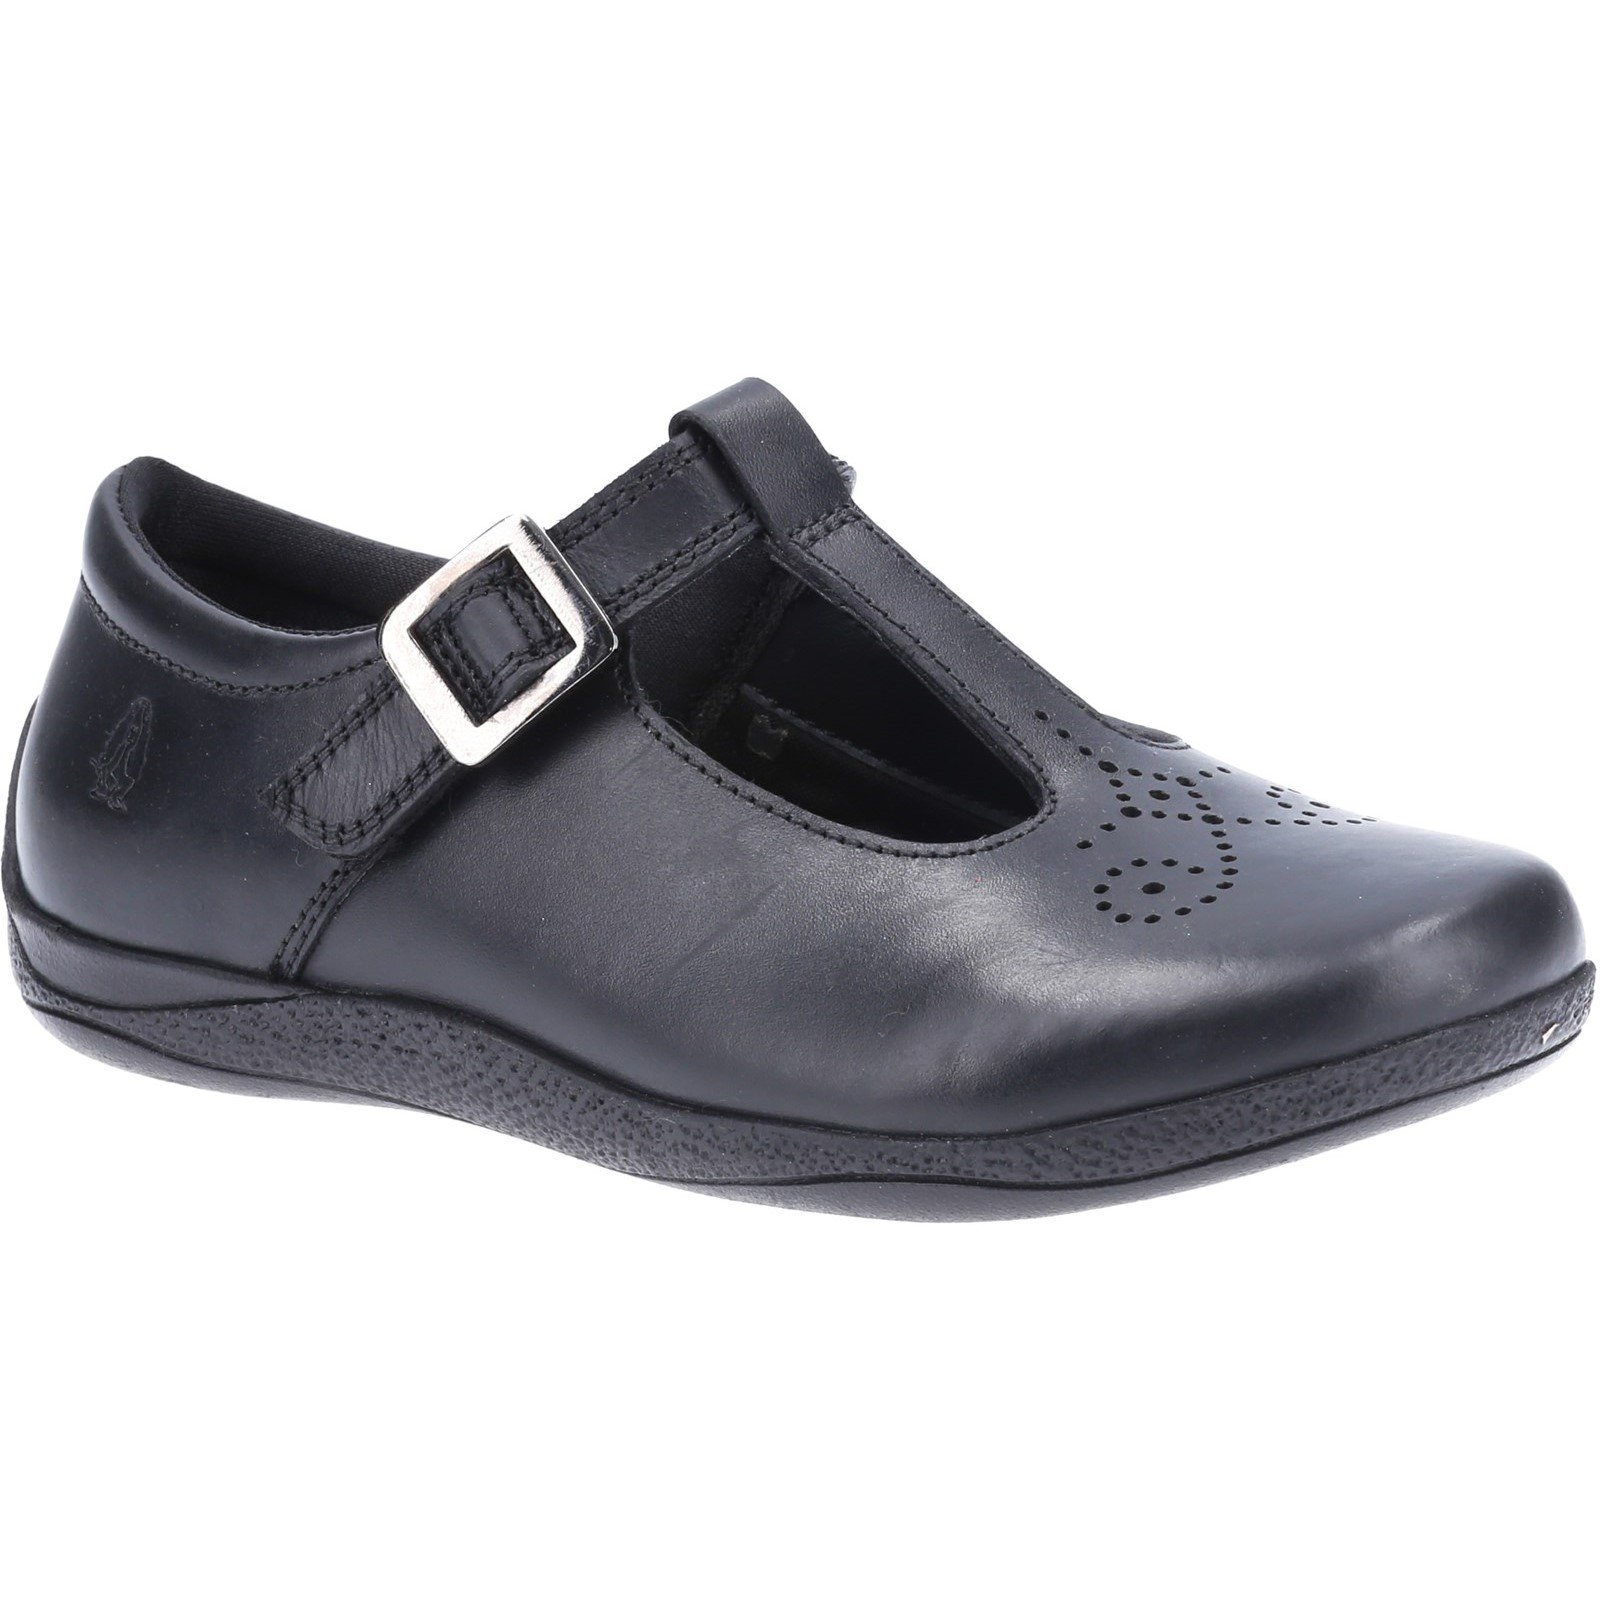 Hush Puppies Kid's Eliza Junior School Shoe Black 32589 - Black 13